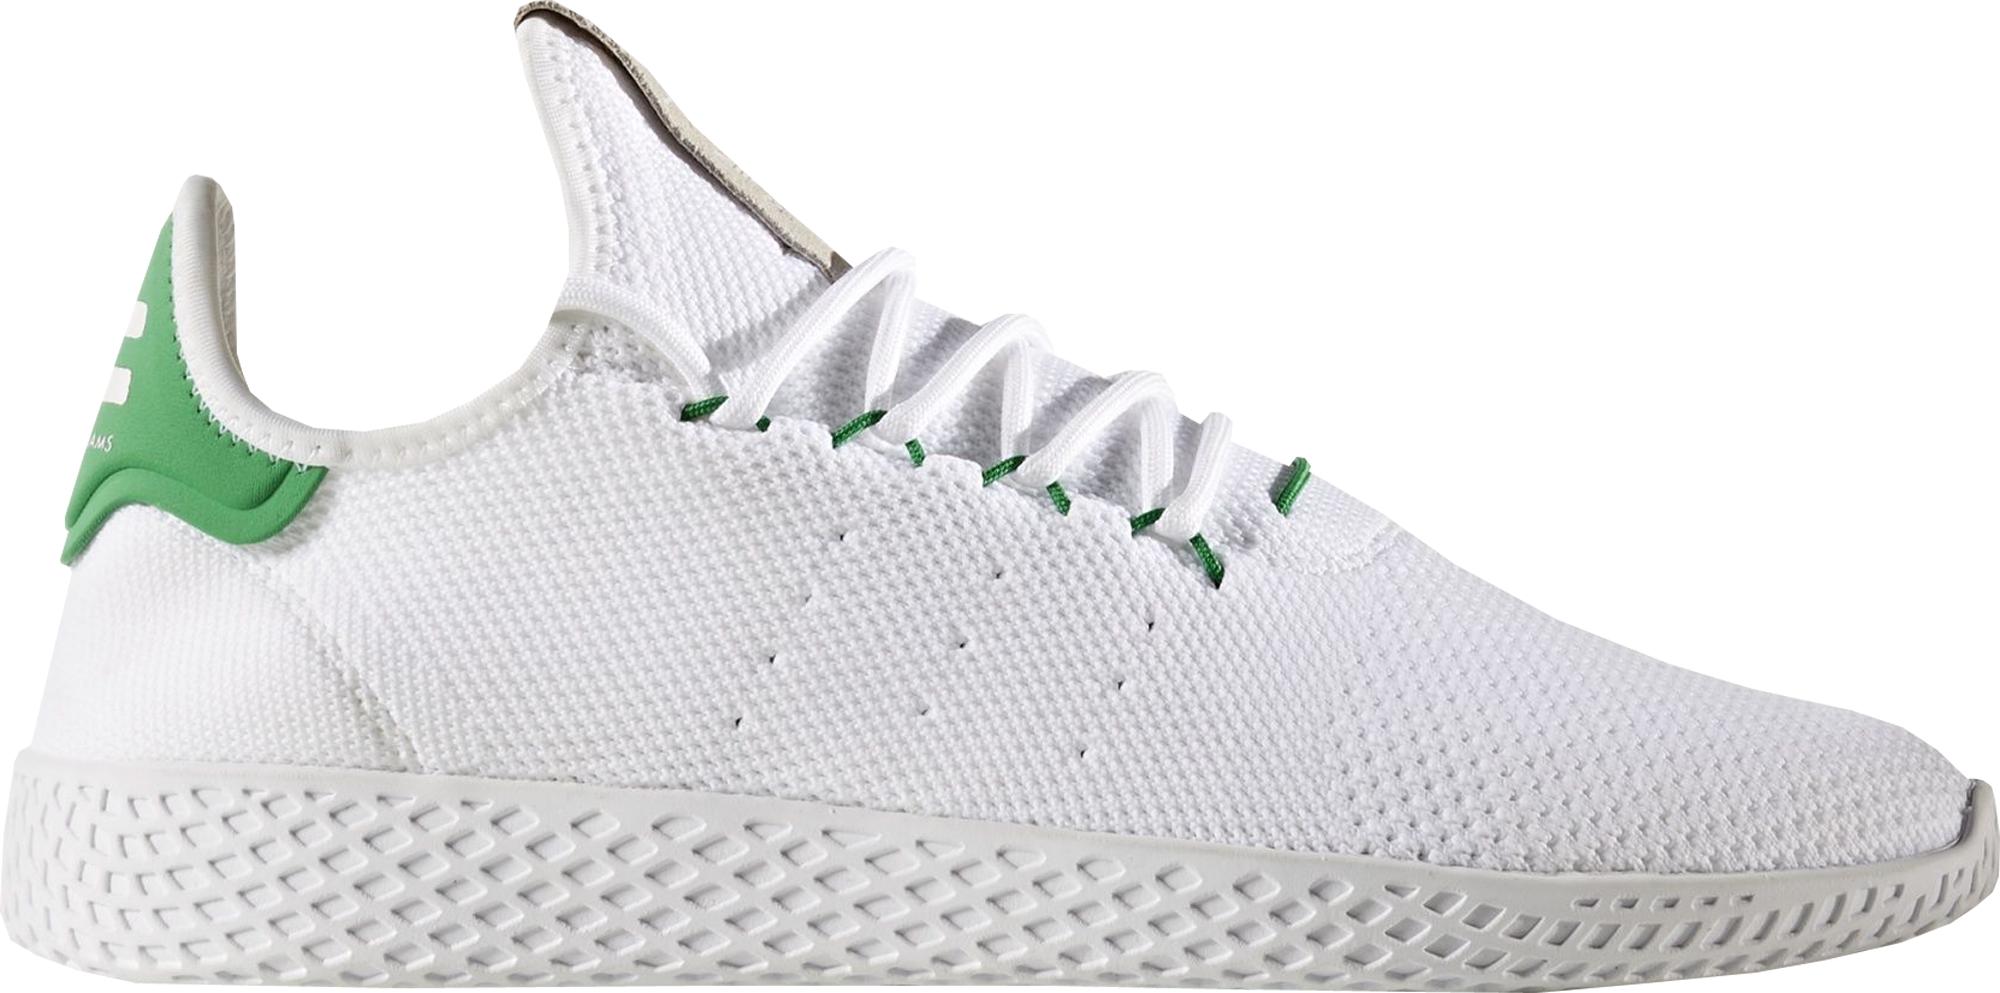 La risa Honestidad Hacia arriba  Pharrell Williams x adidas Tennis Hu White Green - StockX News